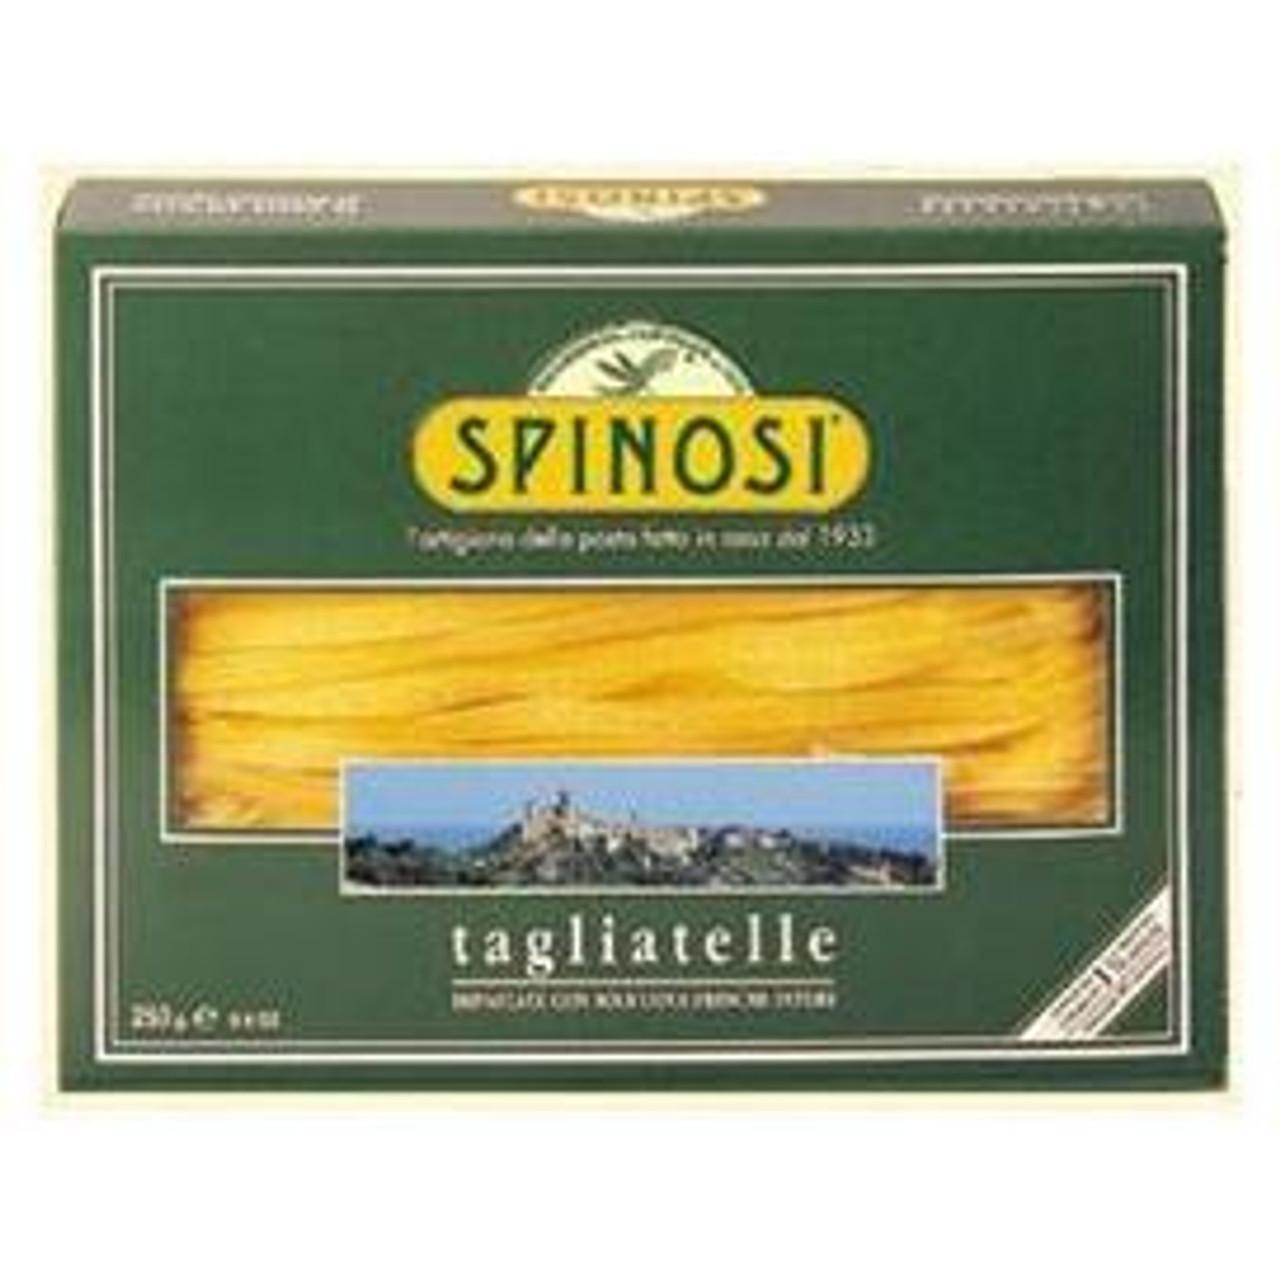 Tagliatelle Egg Pasta